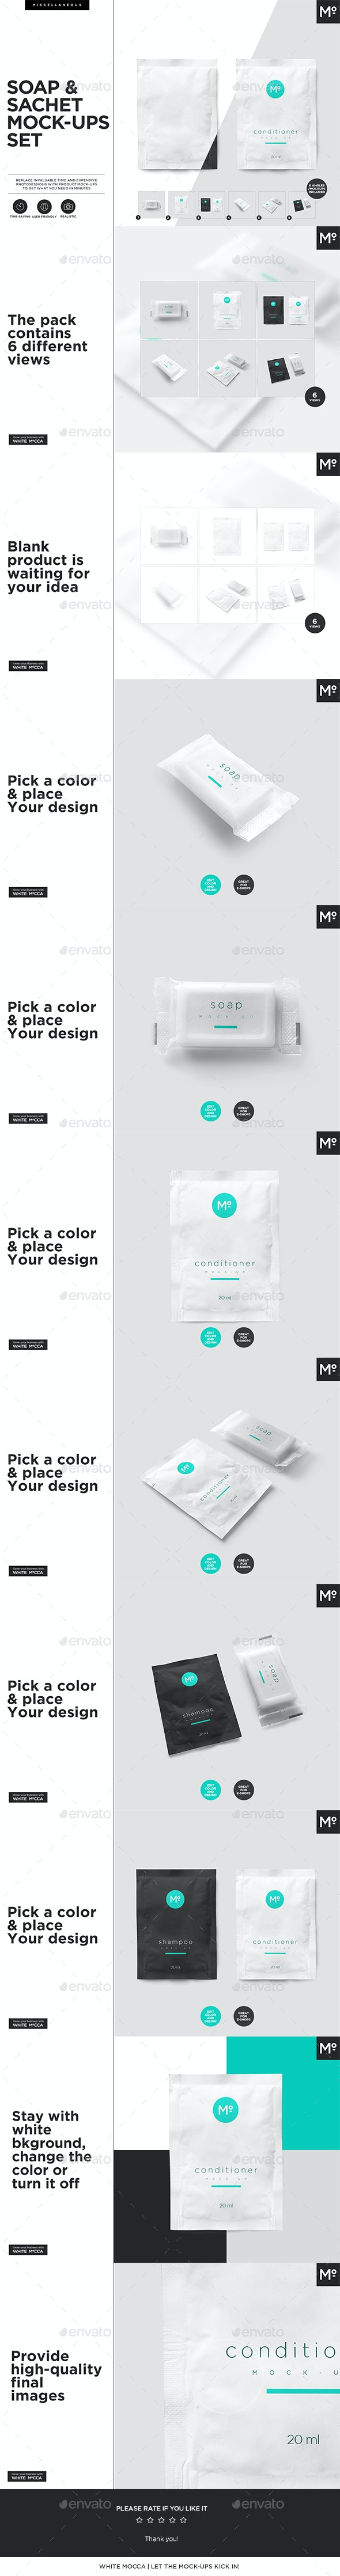 Soap and Sachete Shampoo Mock-ups Set - Beauty Packaging